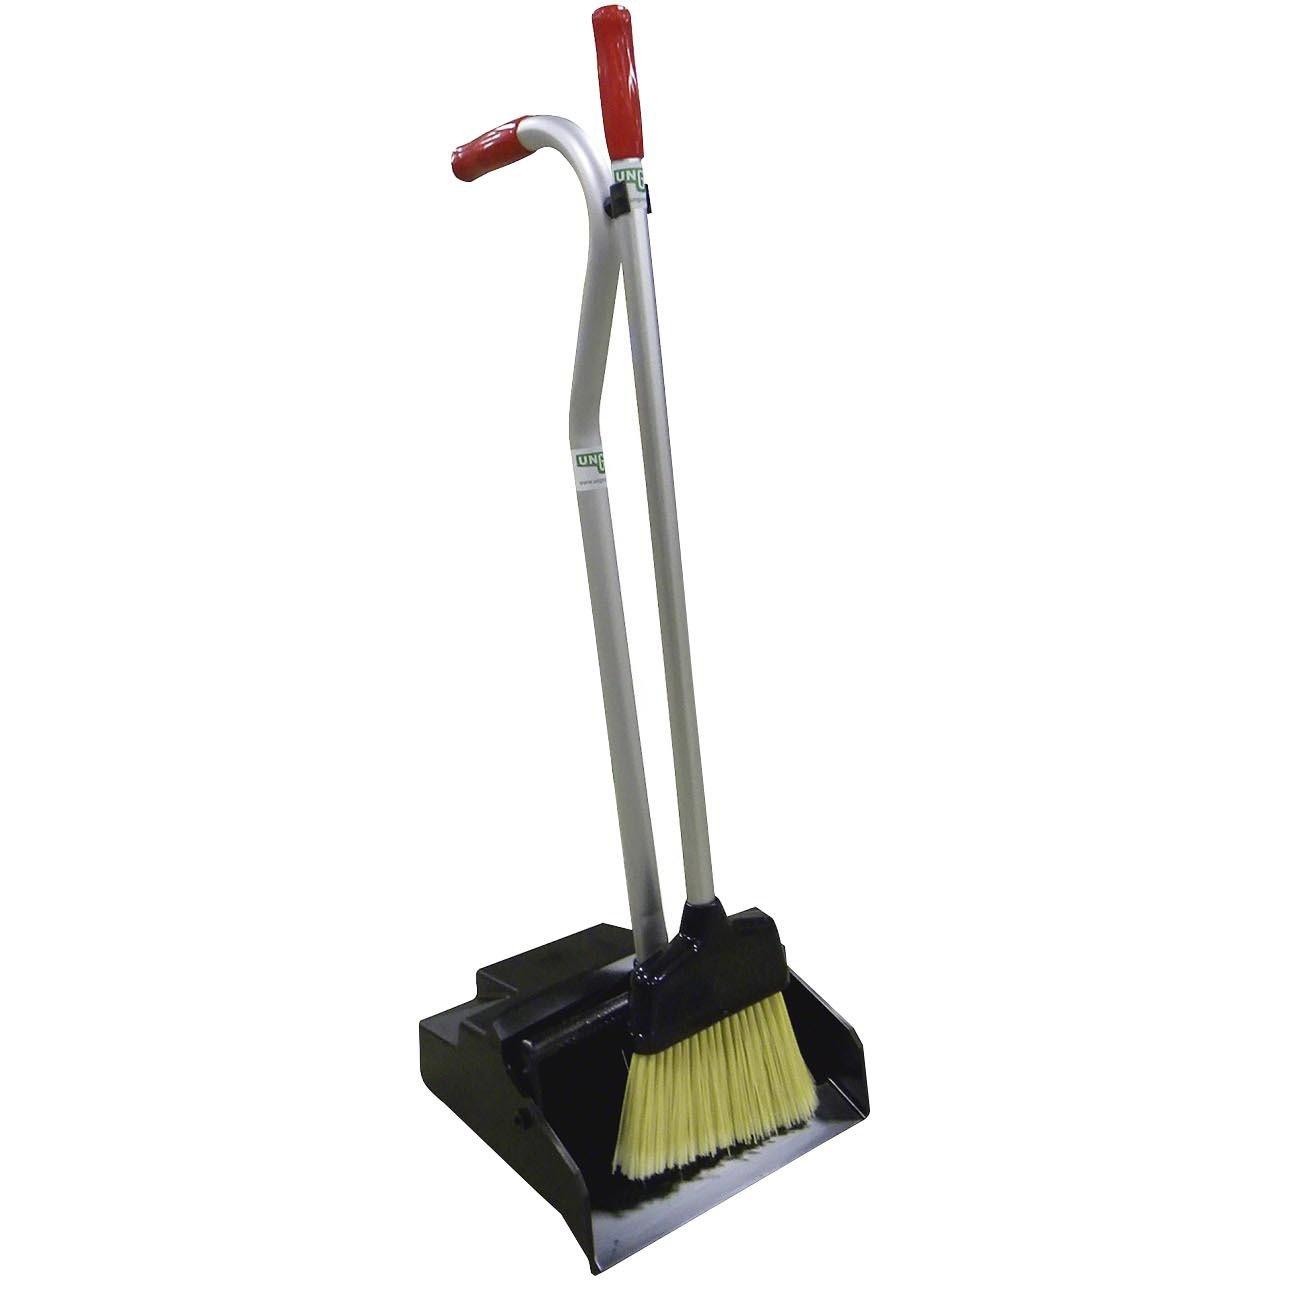 Unger Ergo Dustpan/Broom by Unger